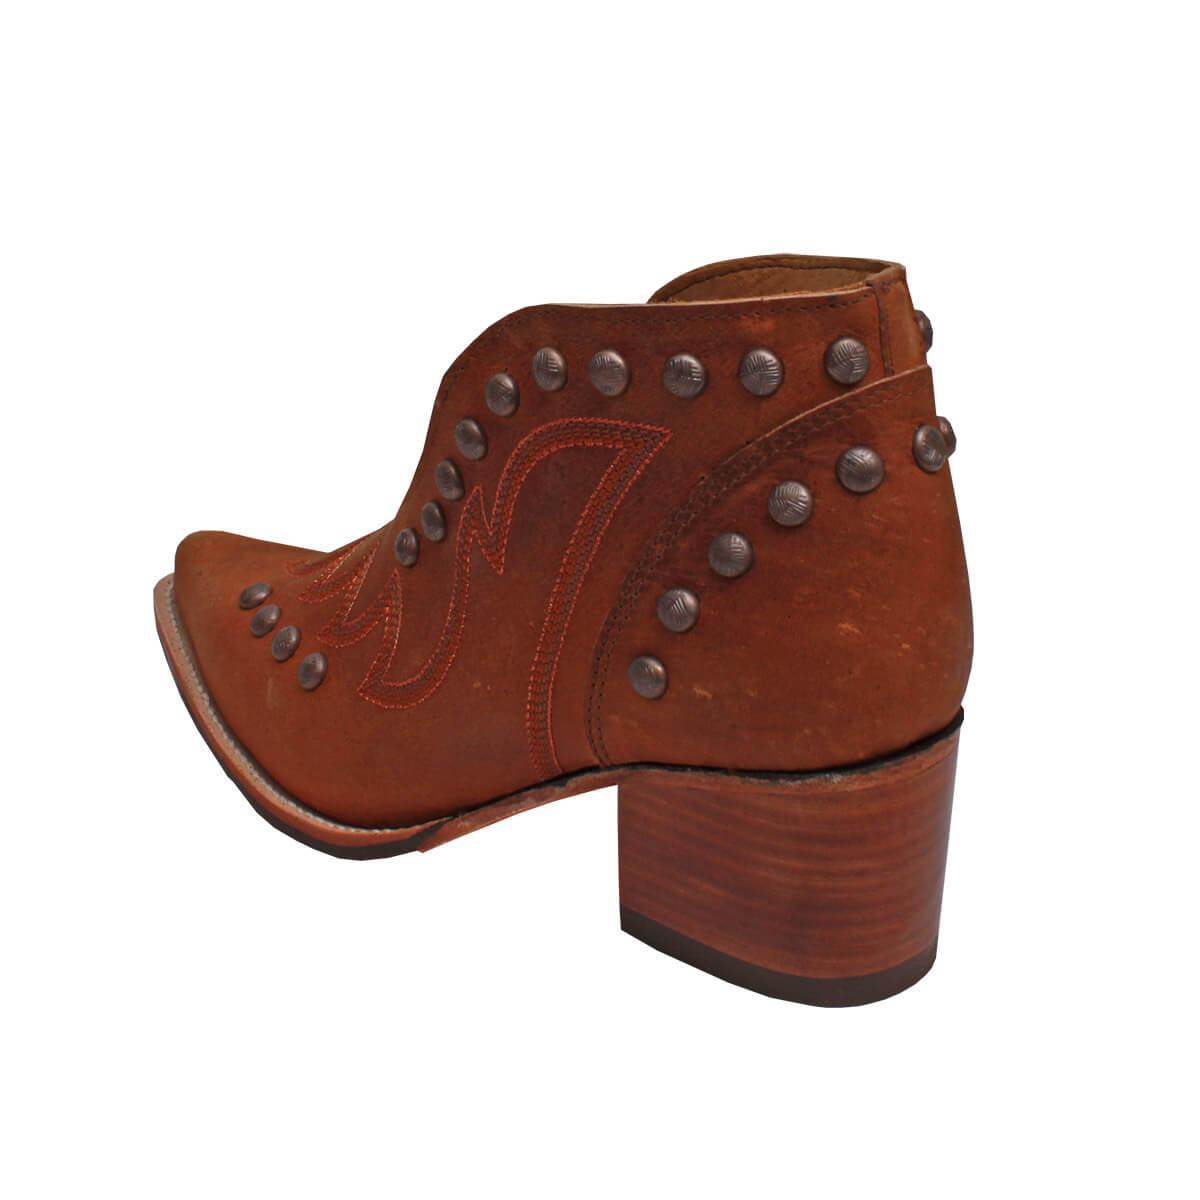 Sapato Goyazes Feminino Solado De Couro